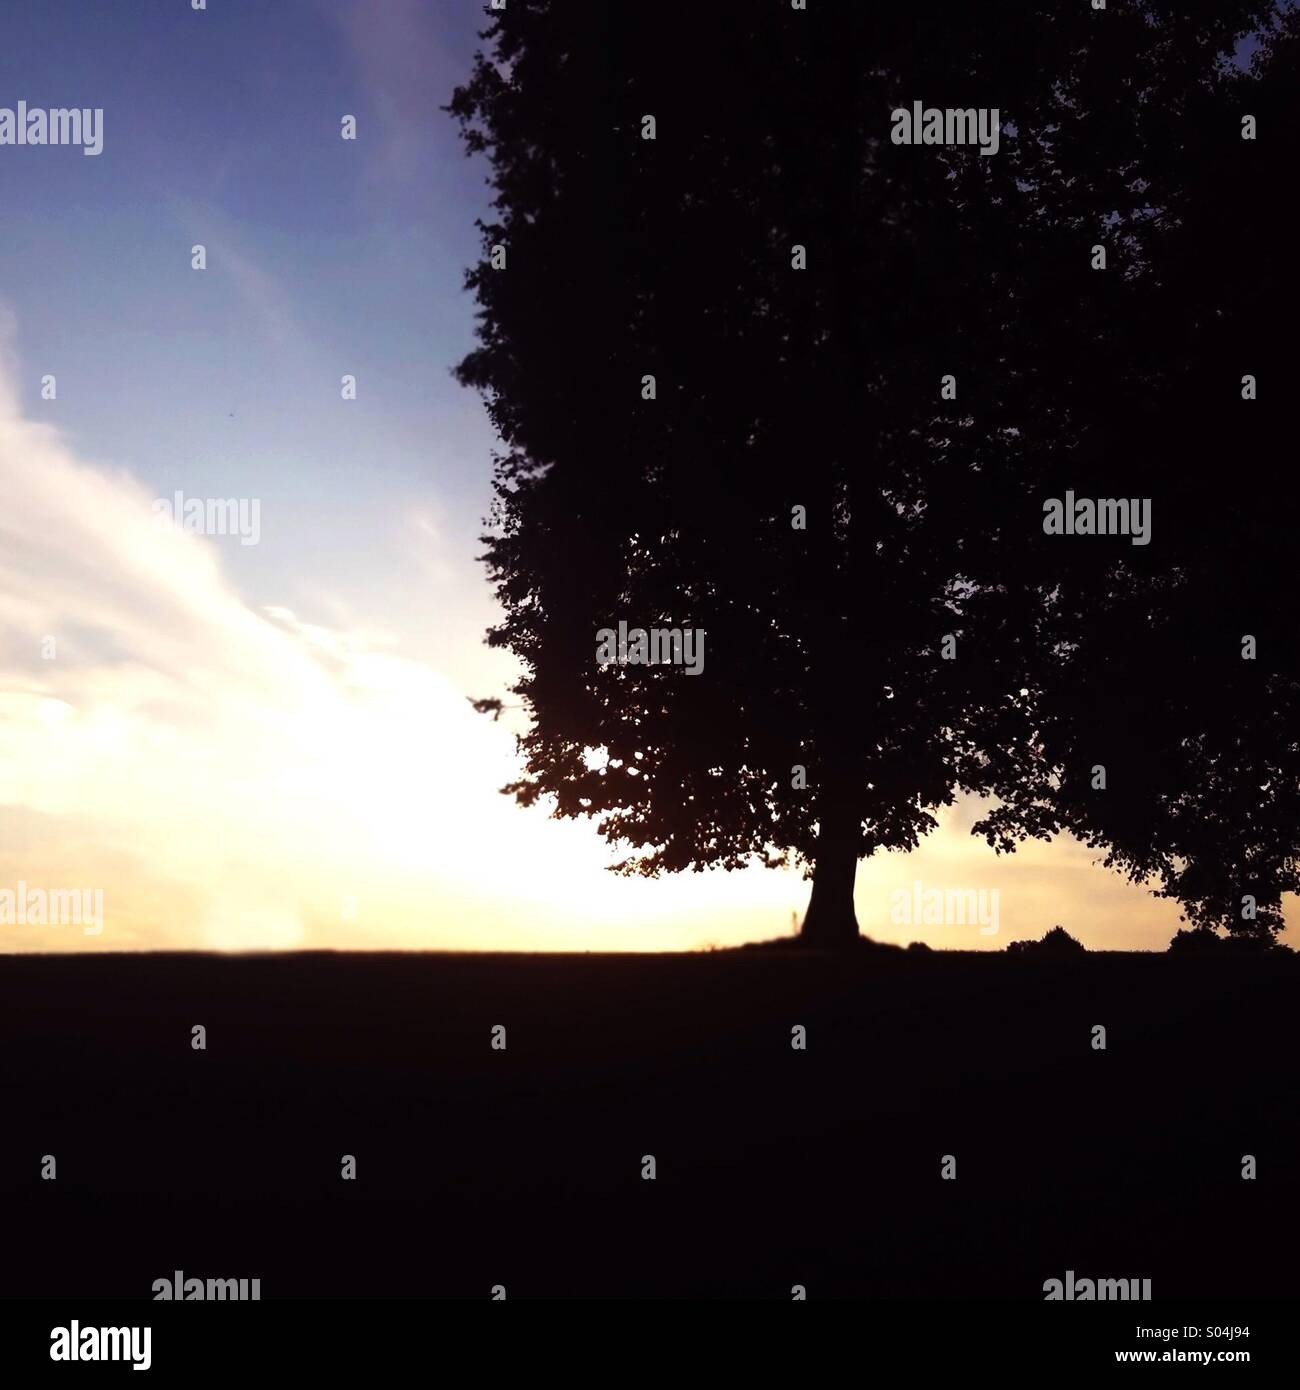 Evening Tree - Stock Image